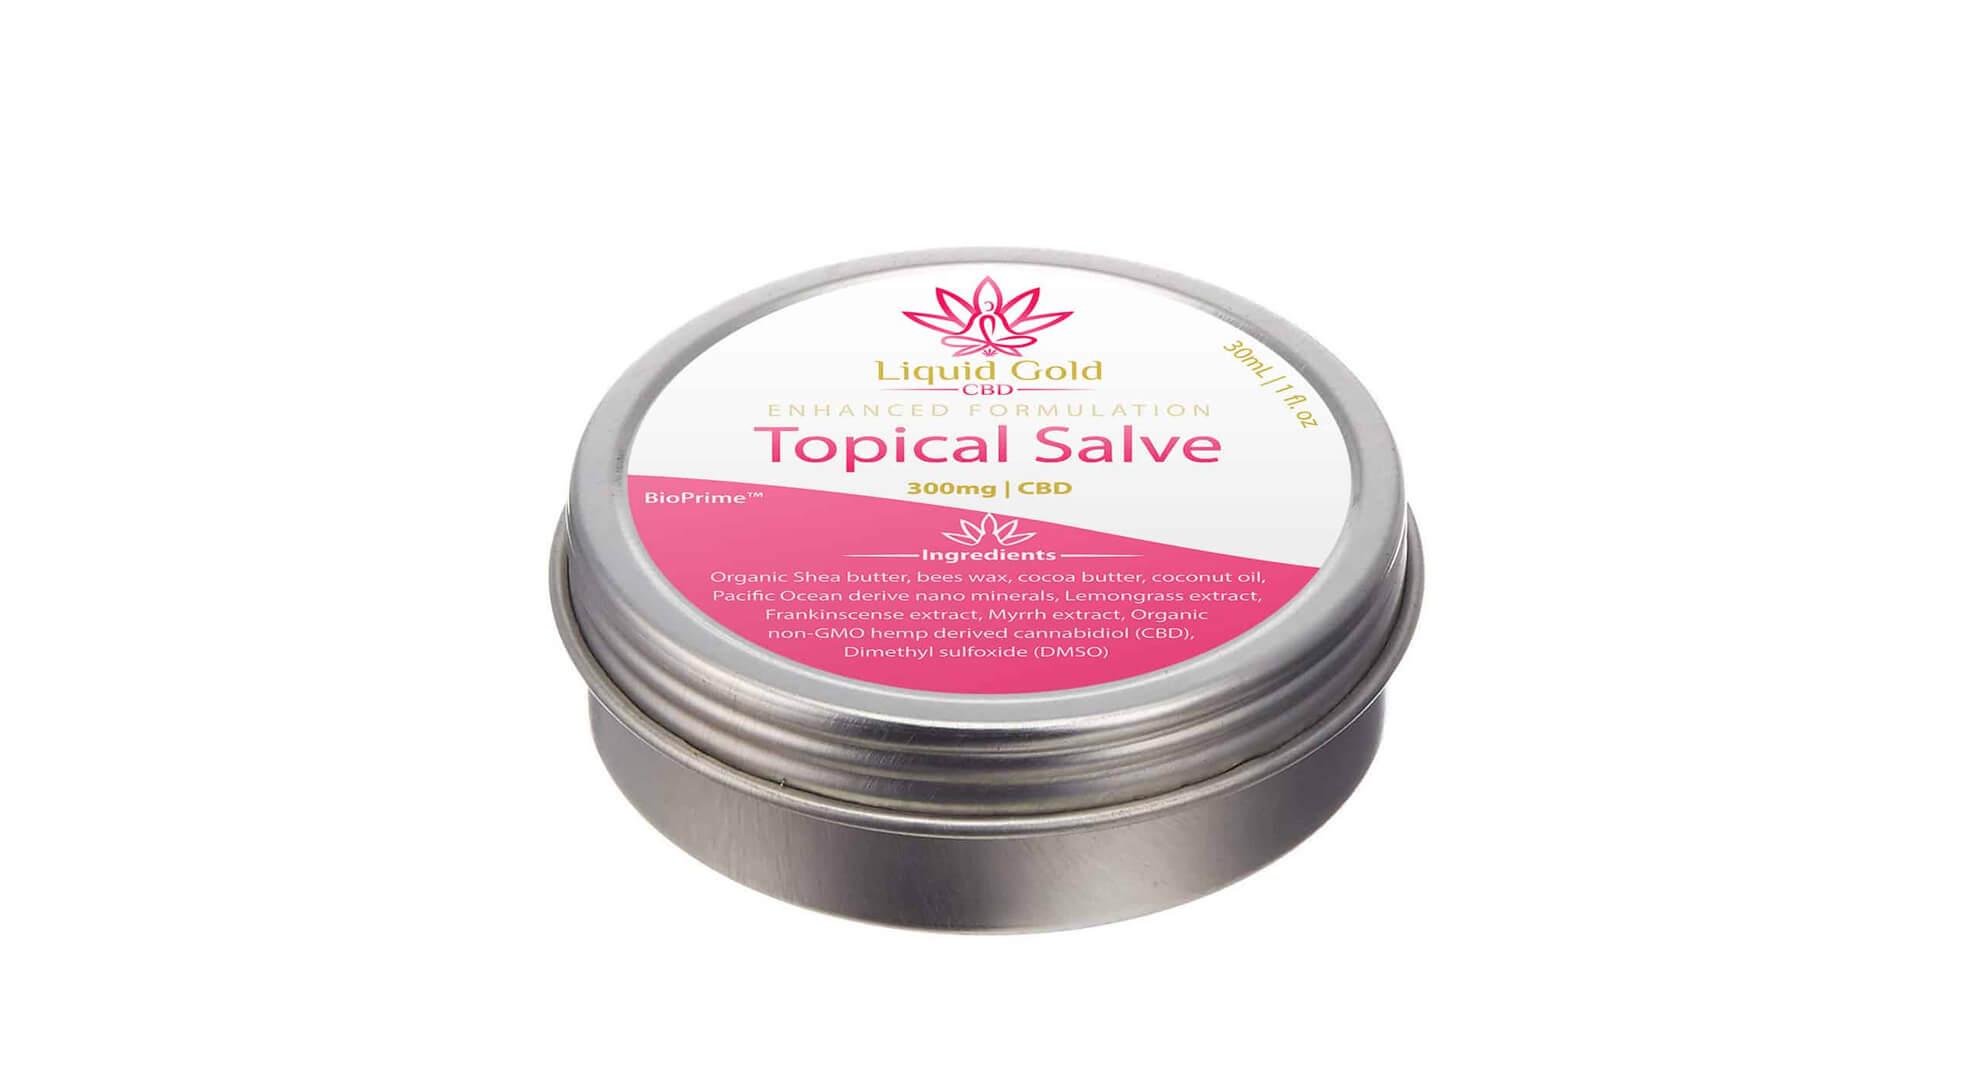 Topical Salve Liquid Gold